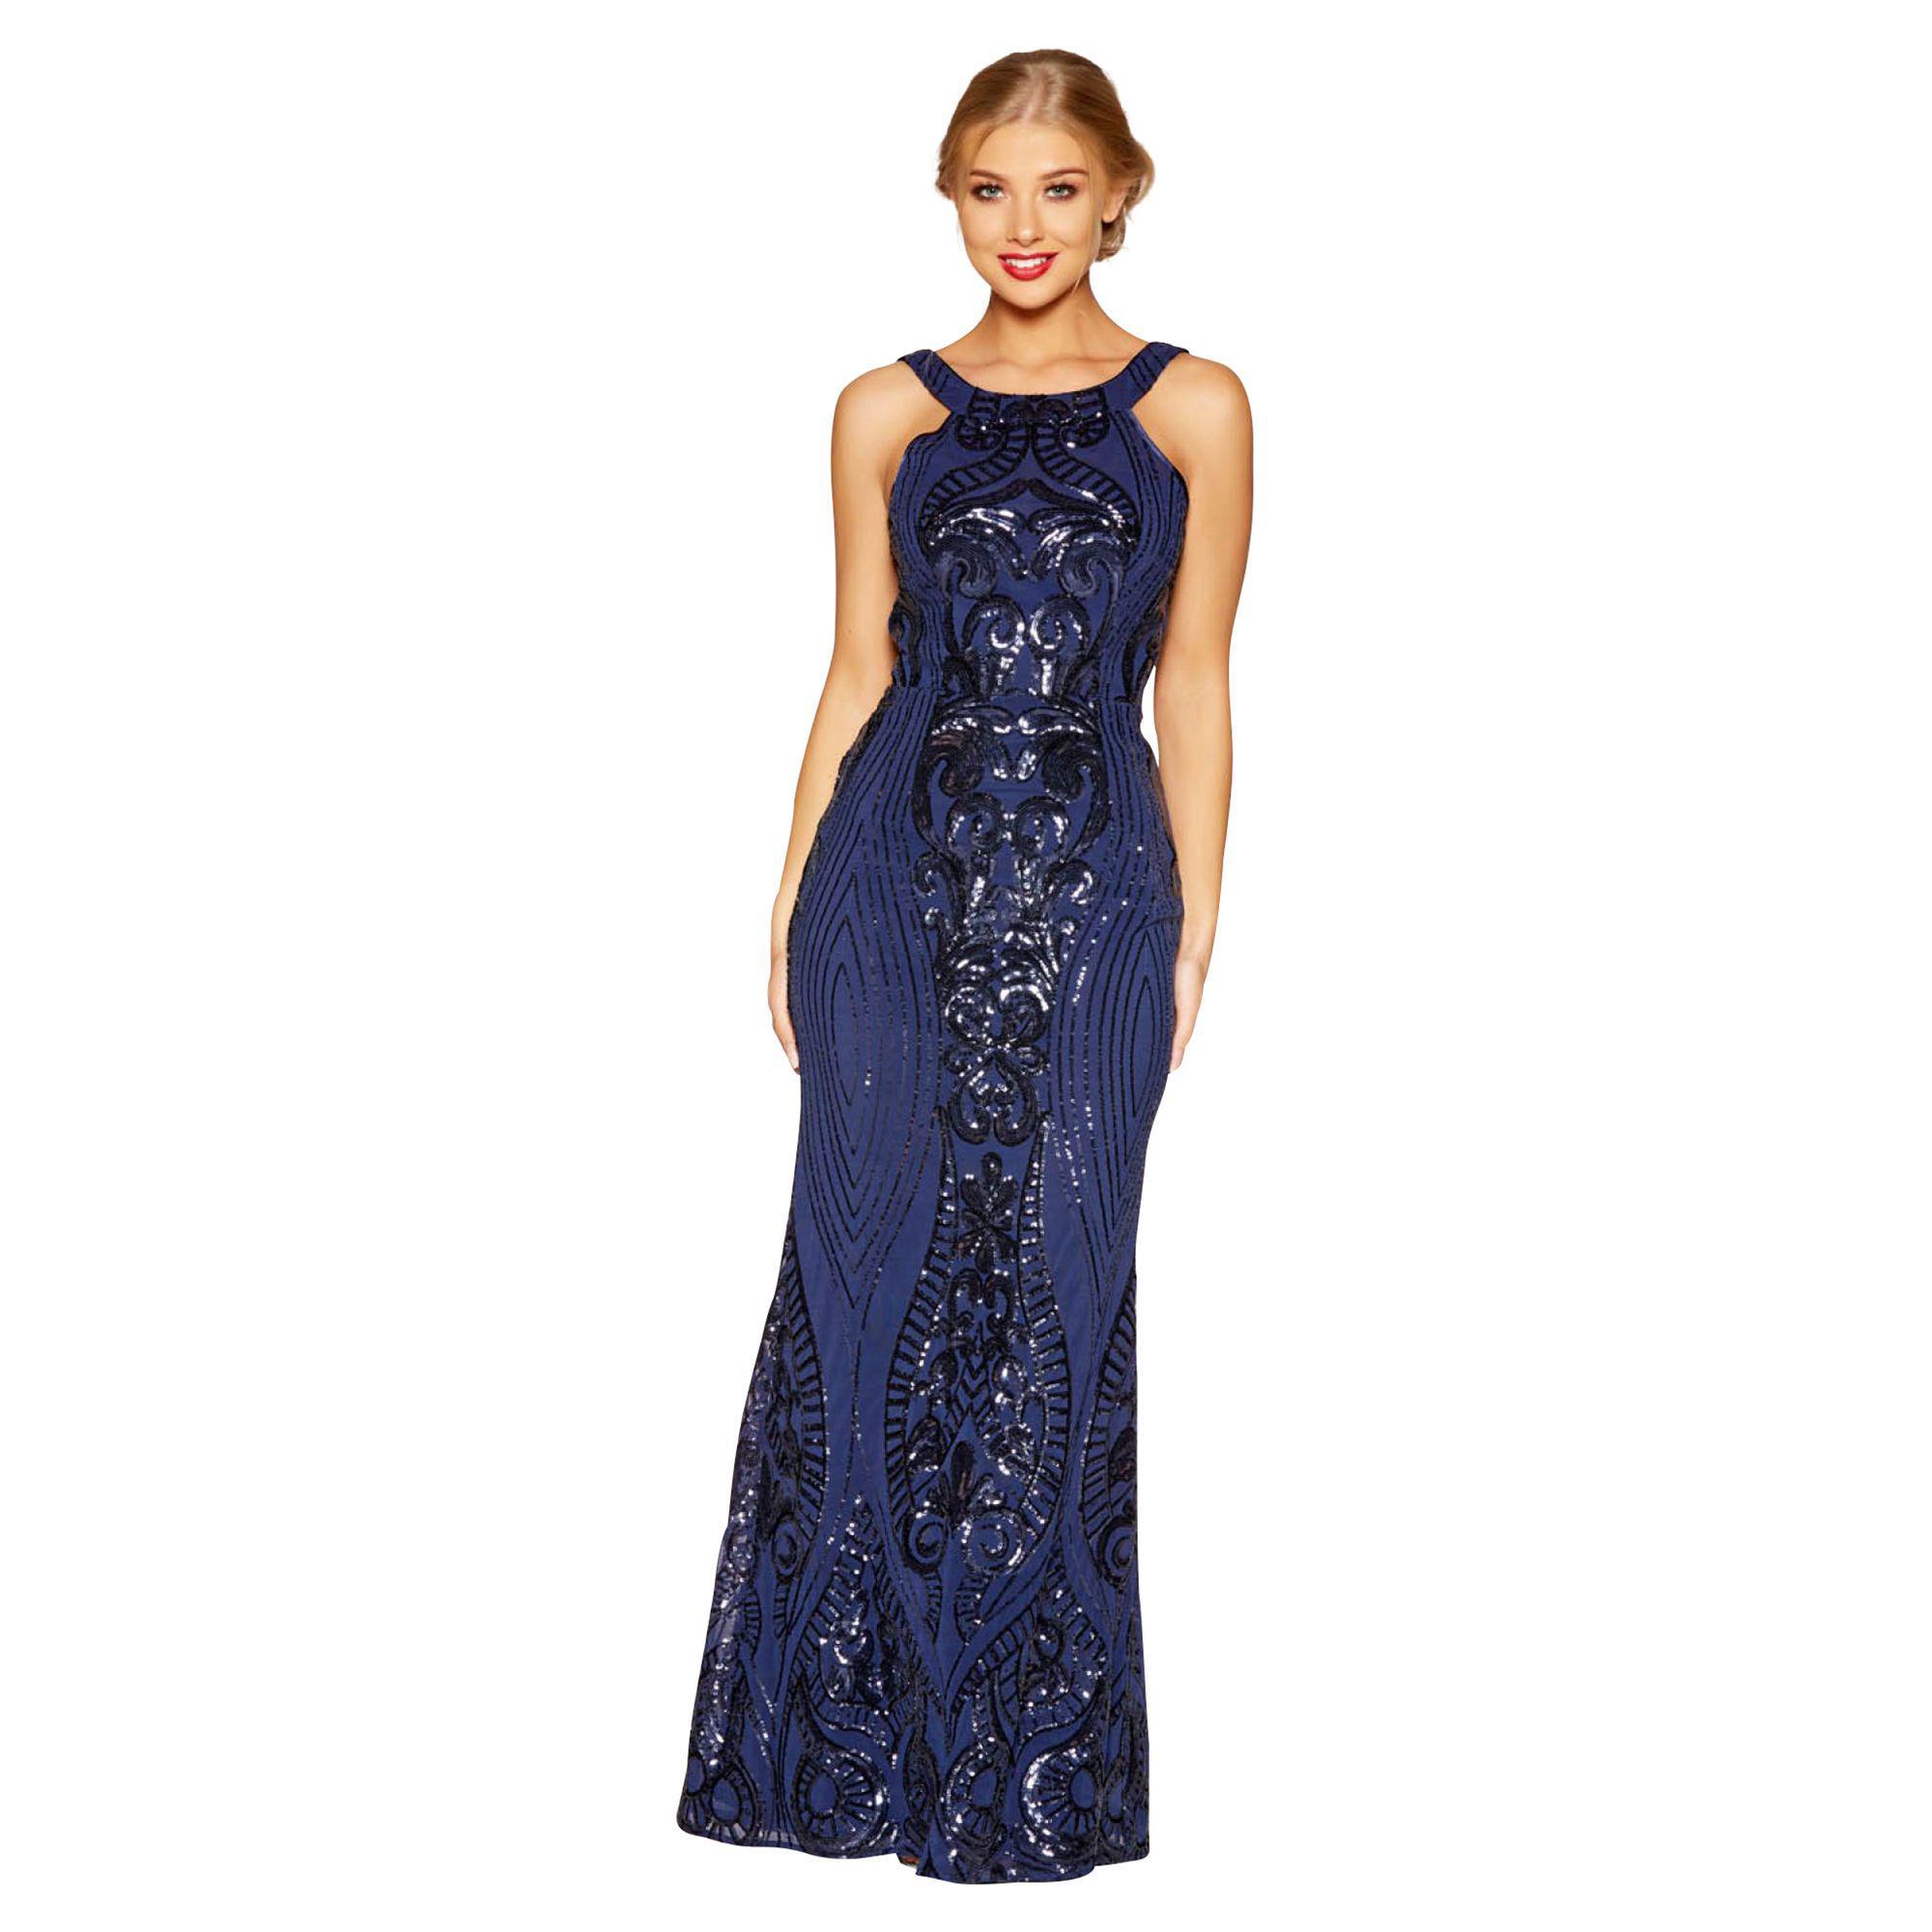 5204b81fe9cd Quiz Navy Sequin Fishtail Maxi Dress in Blue - Lyst